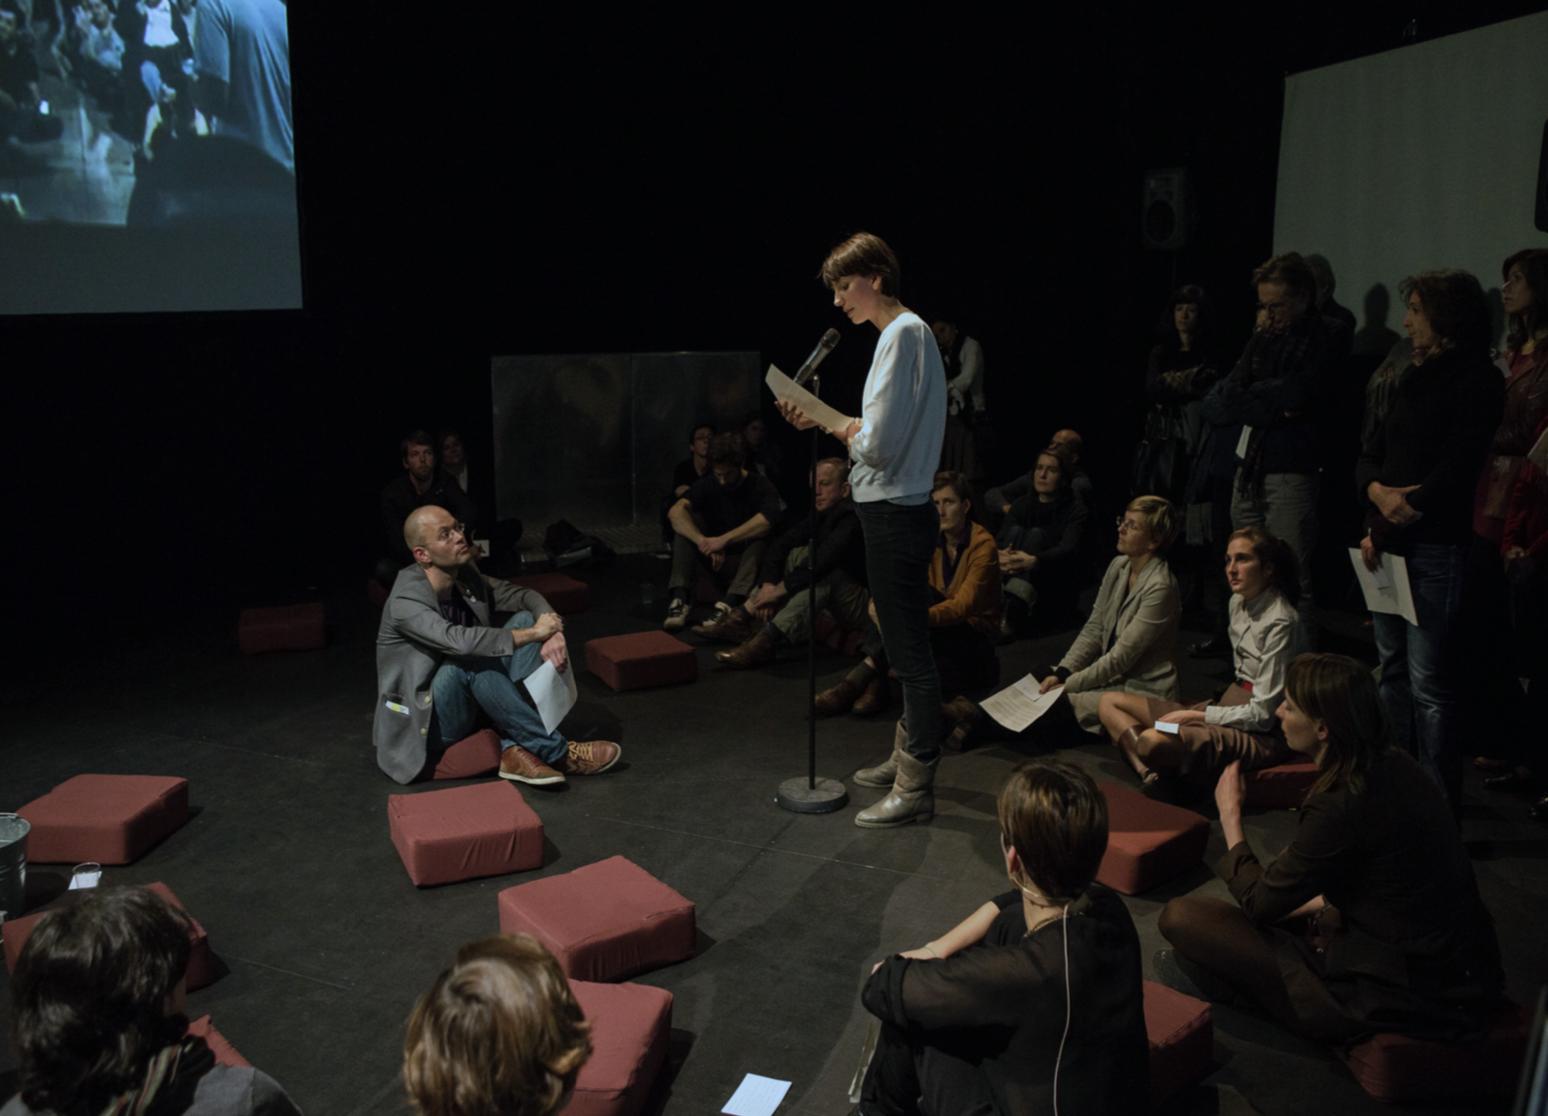 Margarita Tsomou, Waste of History – A Studio Visit, 2013, Hamburg